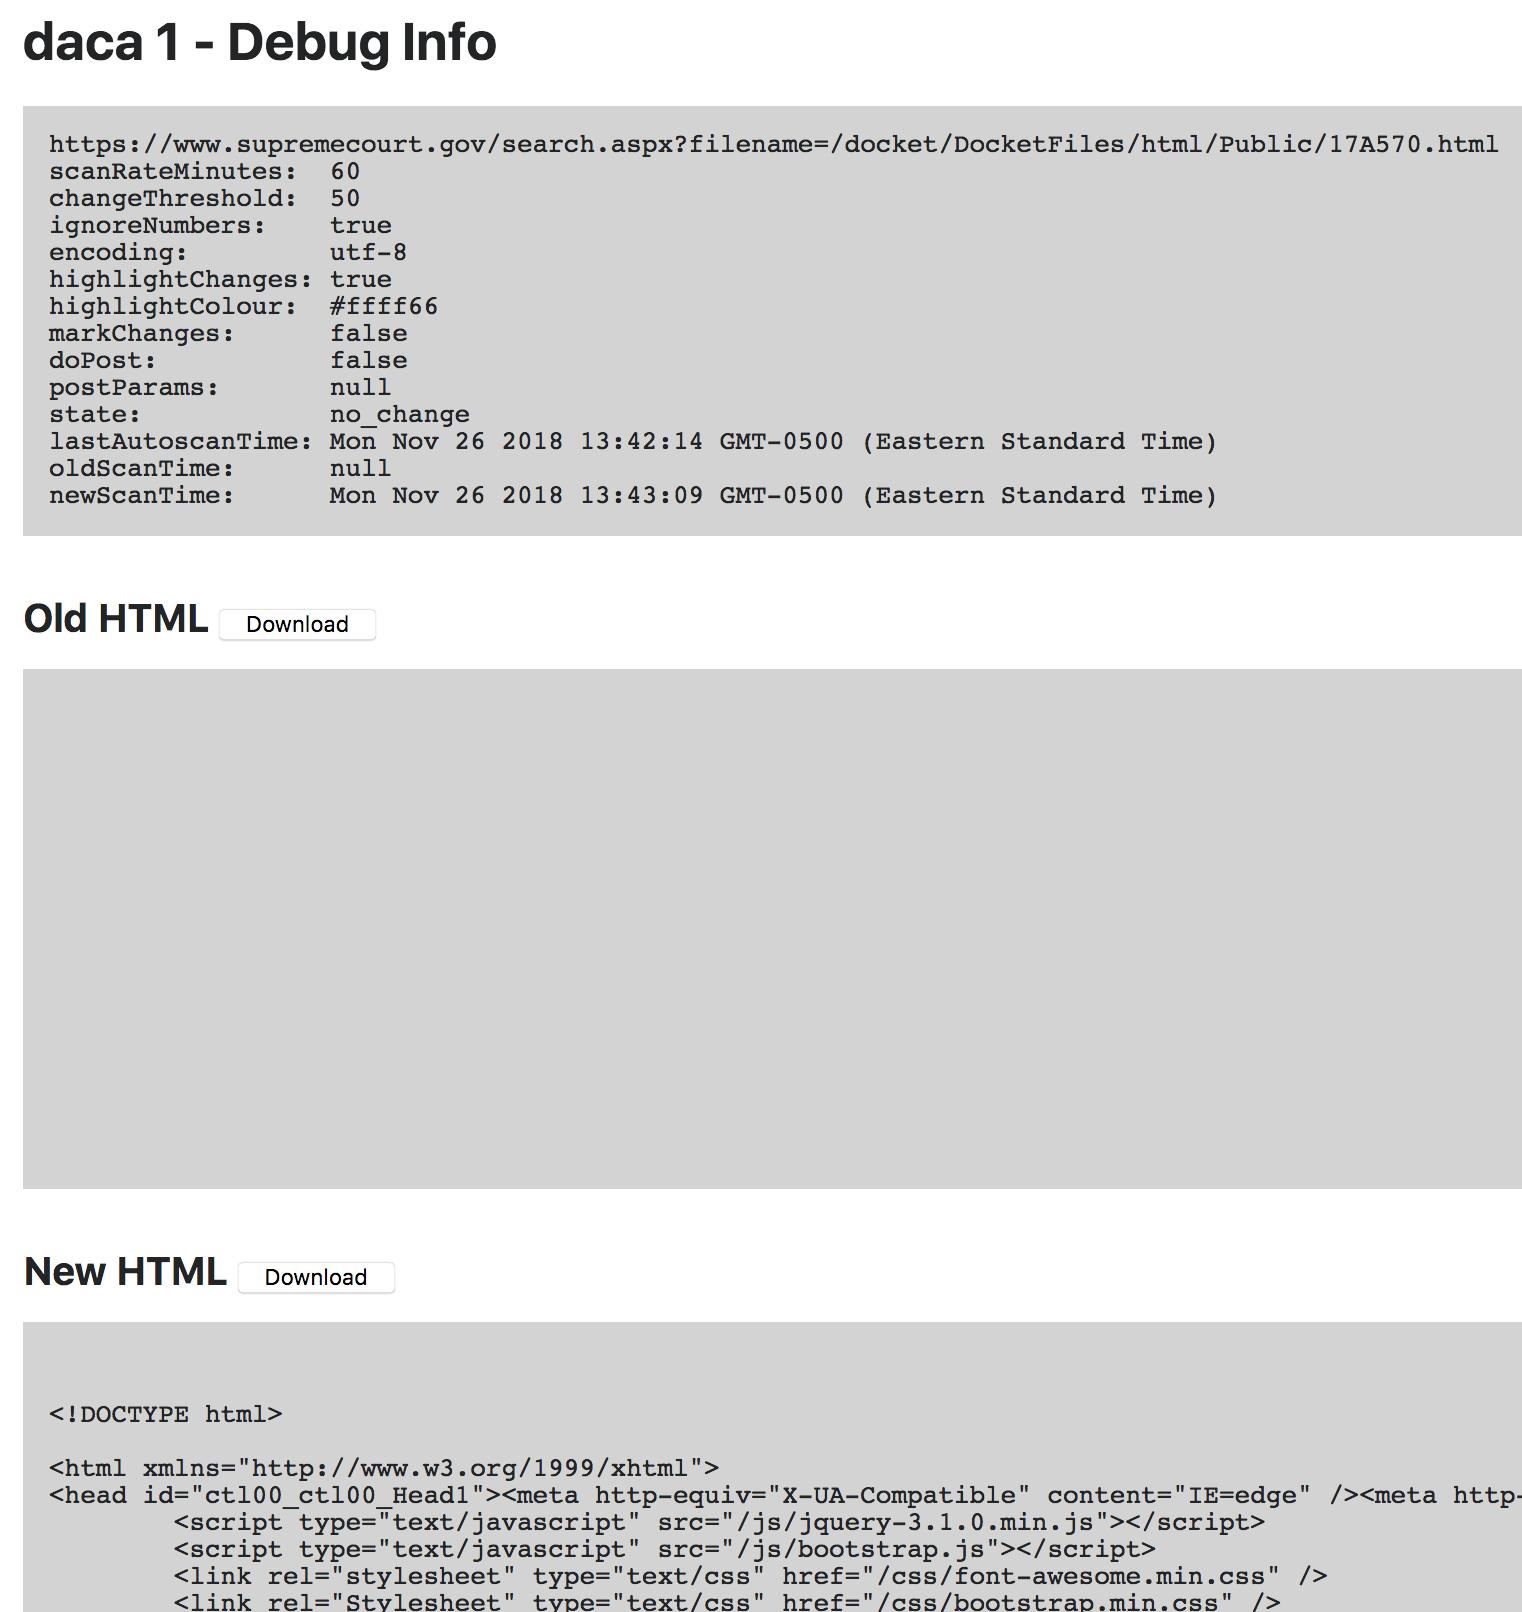 How to troubleshoot script errors in internet explorer.